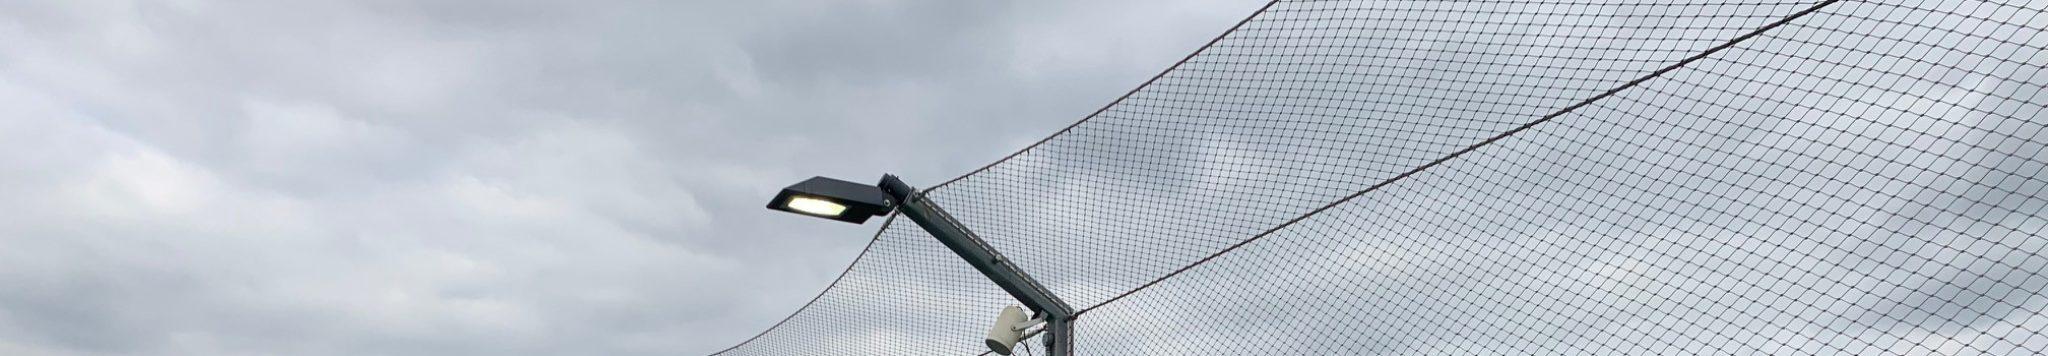 Queensgate Security Fencing, Peterborough (2017)